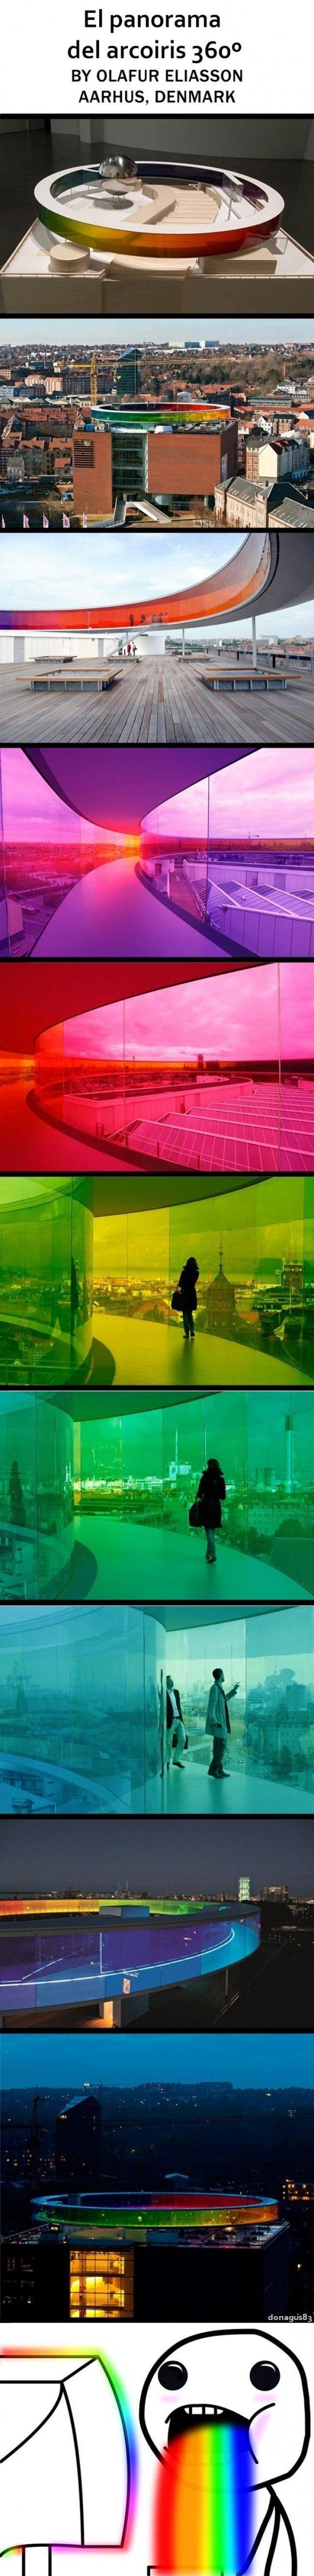 Puke_rainbows - Vivir al final del arcoiris ya es posible